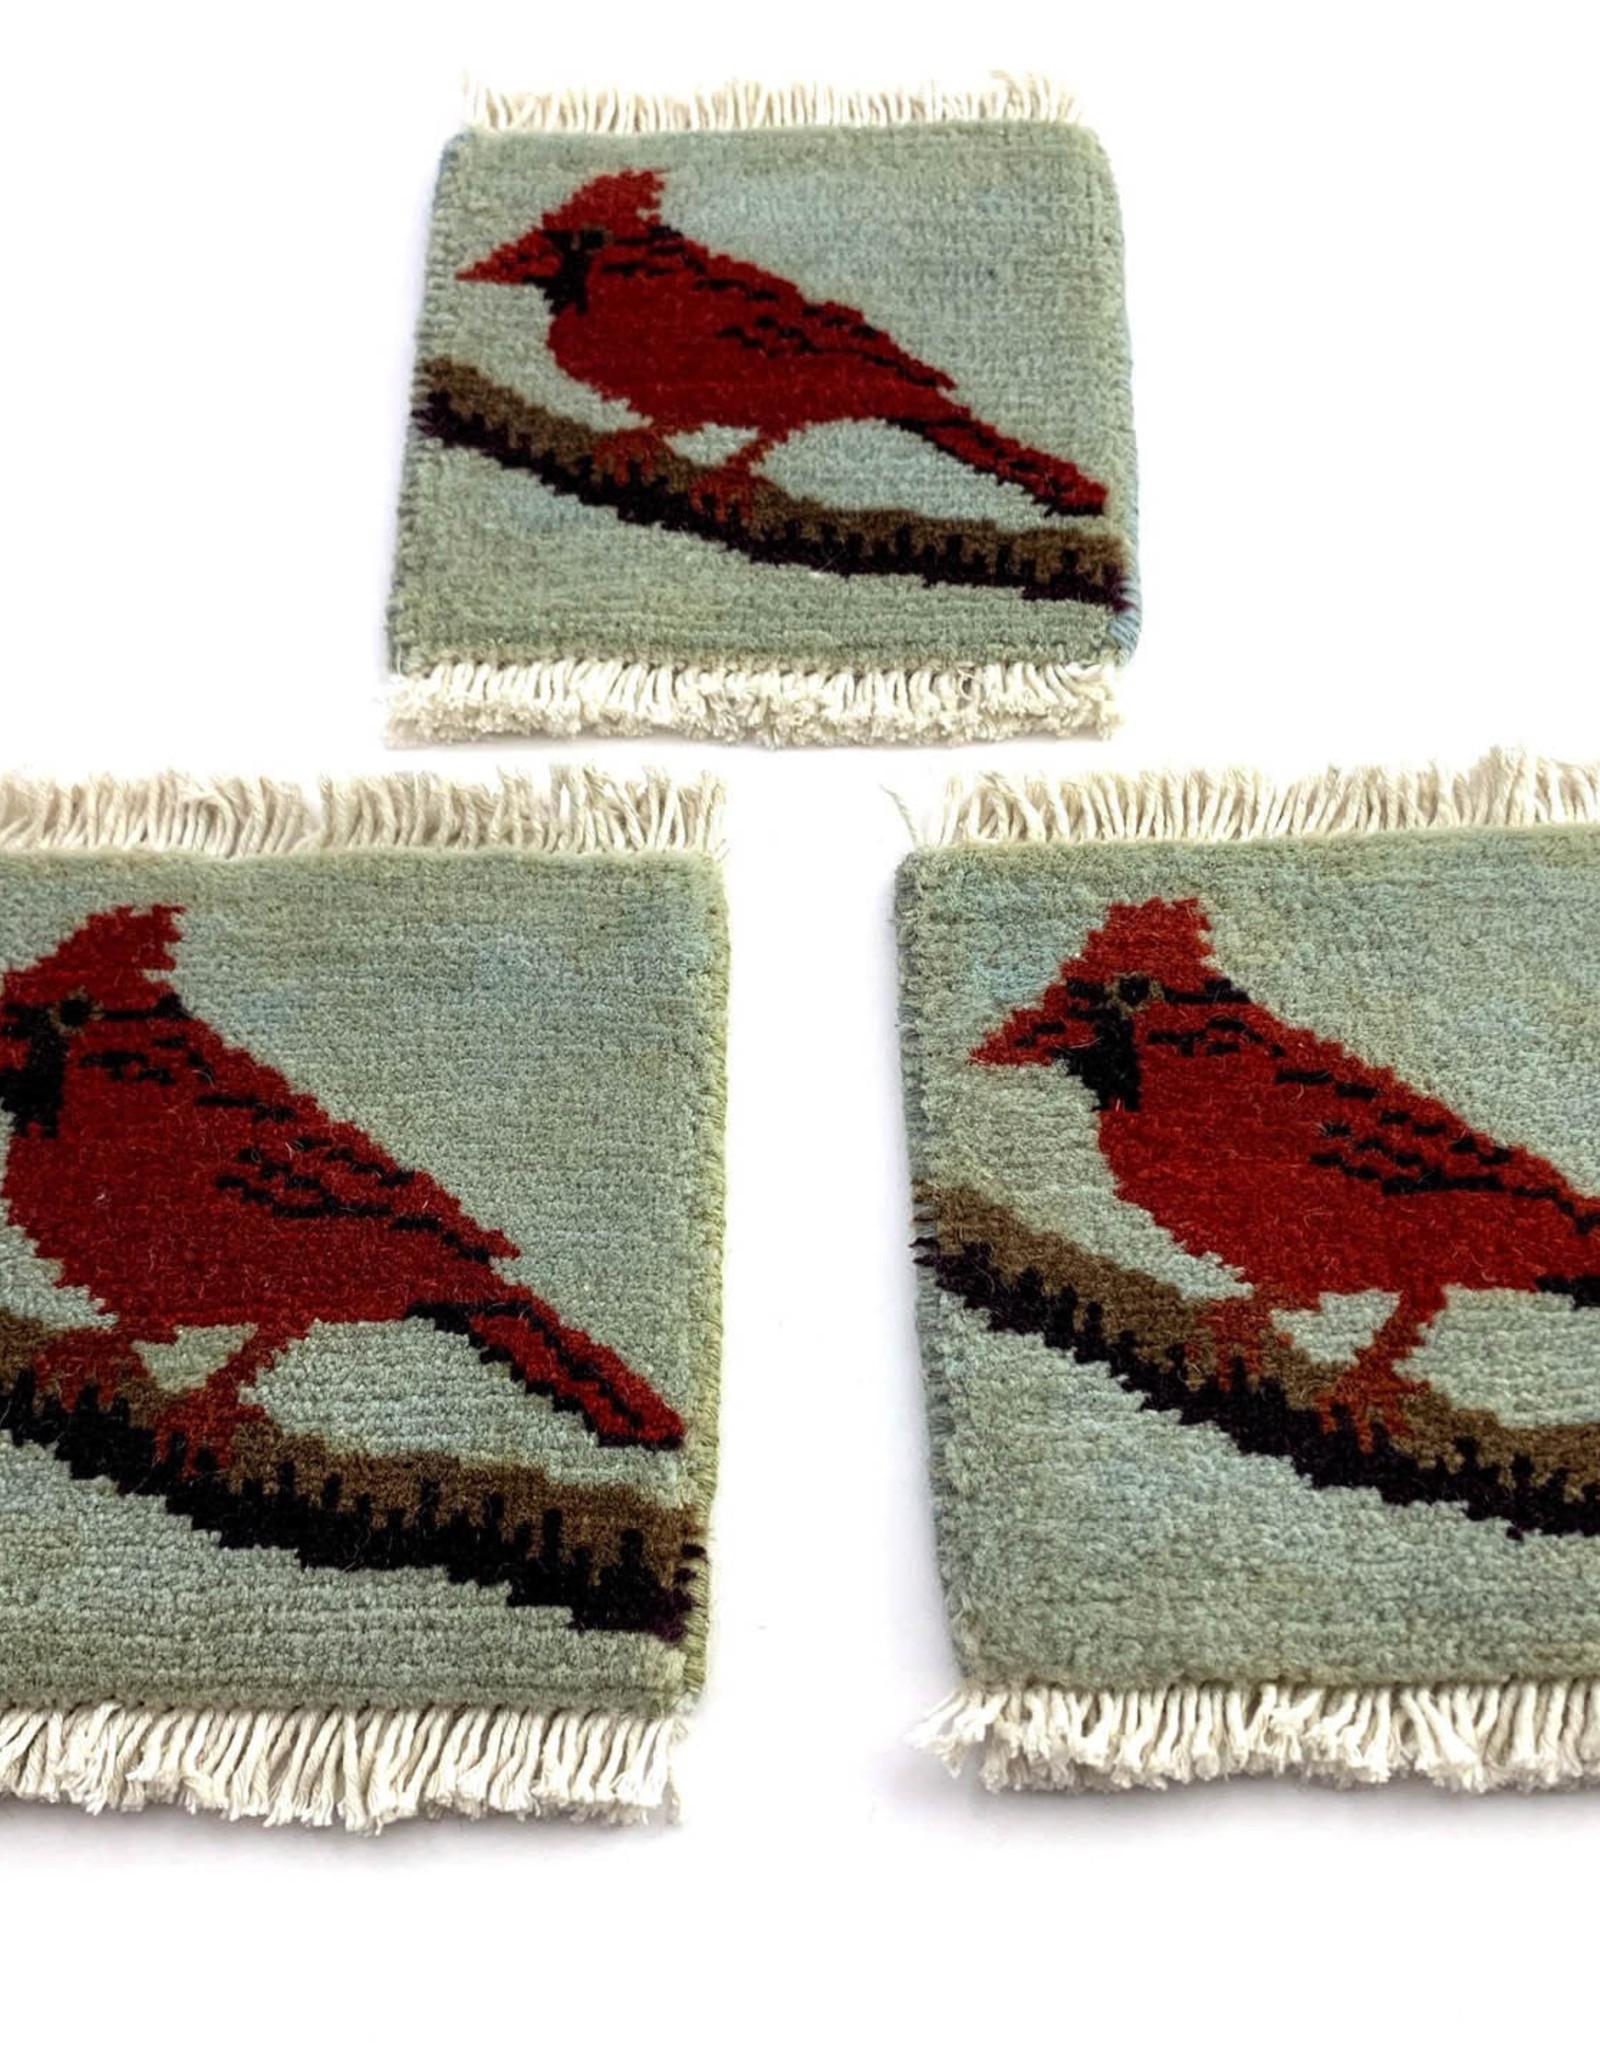 Cardinal on Branch Mug Rug Blue